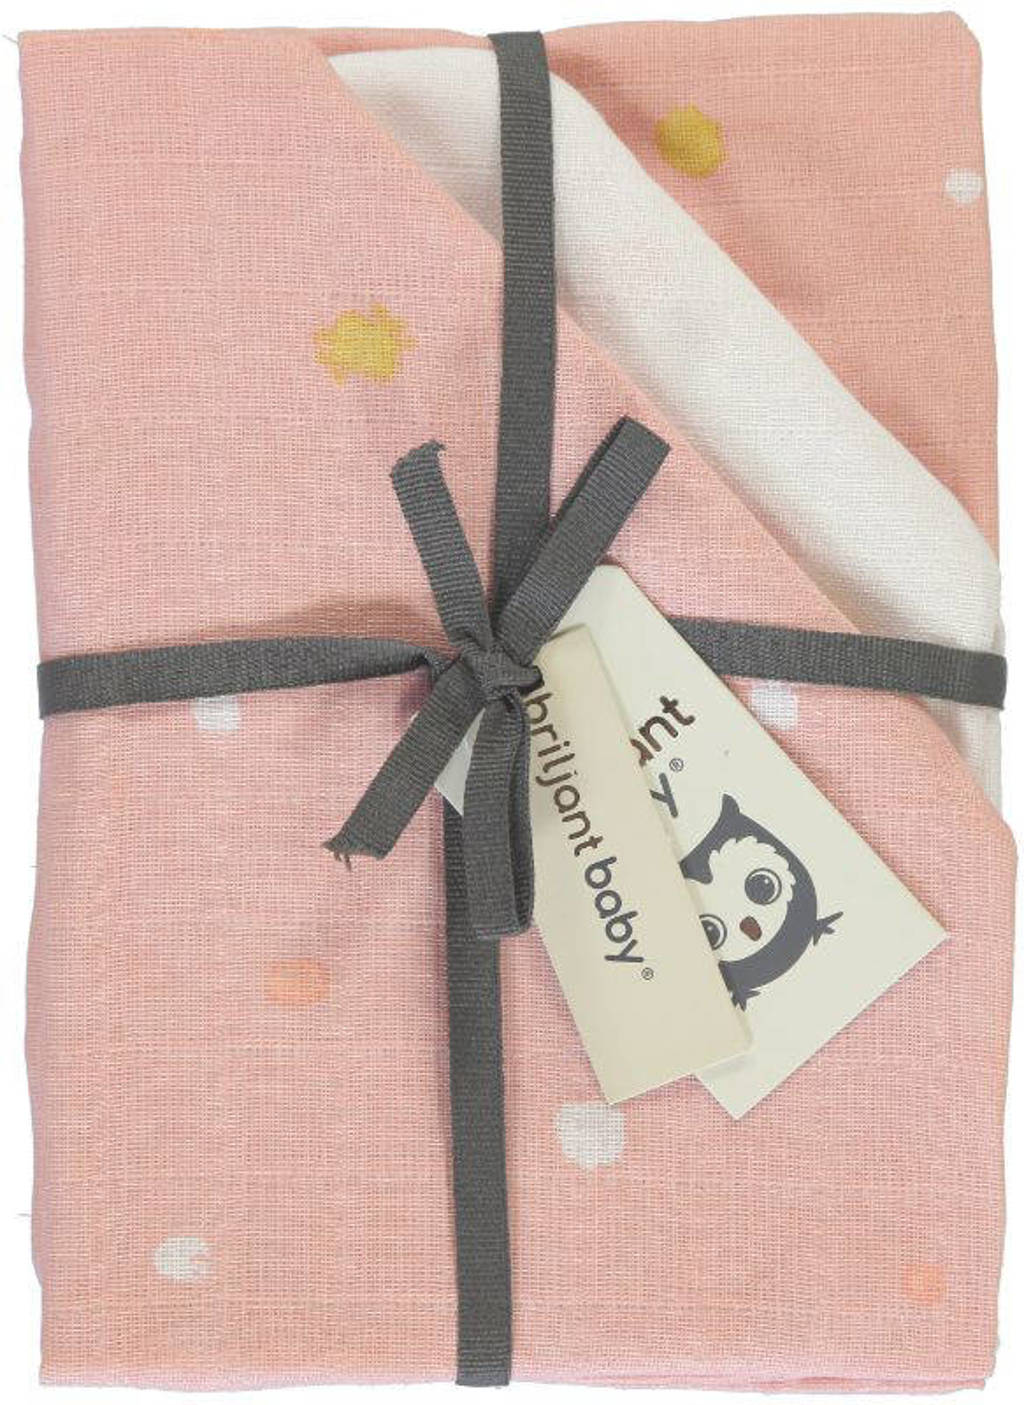 Briljant Baby Sunny hydrofiele luier stip - set van 3 70x70 cm roze/wit, Roze/wit